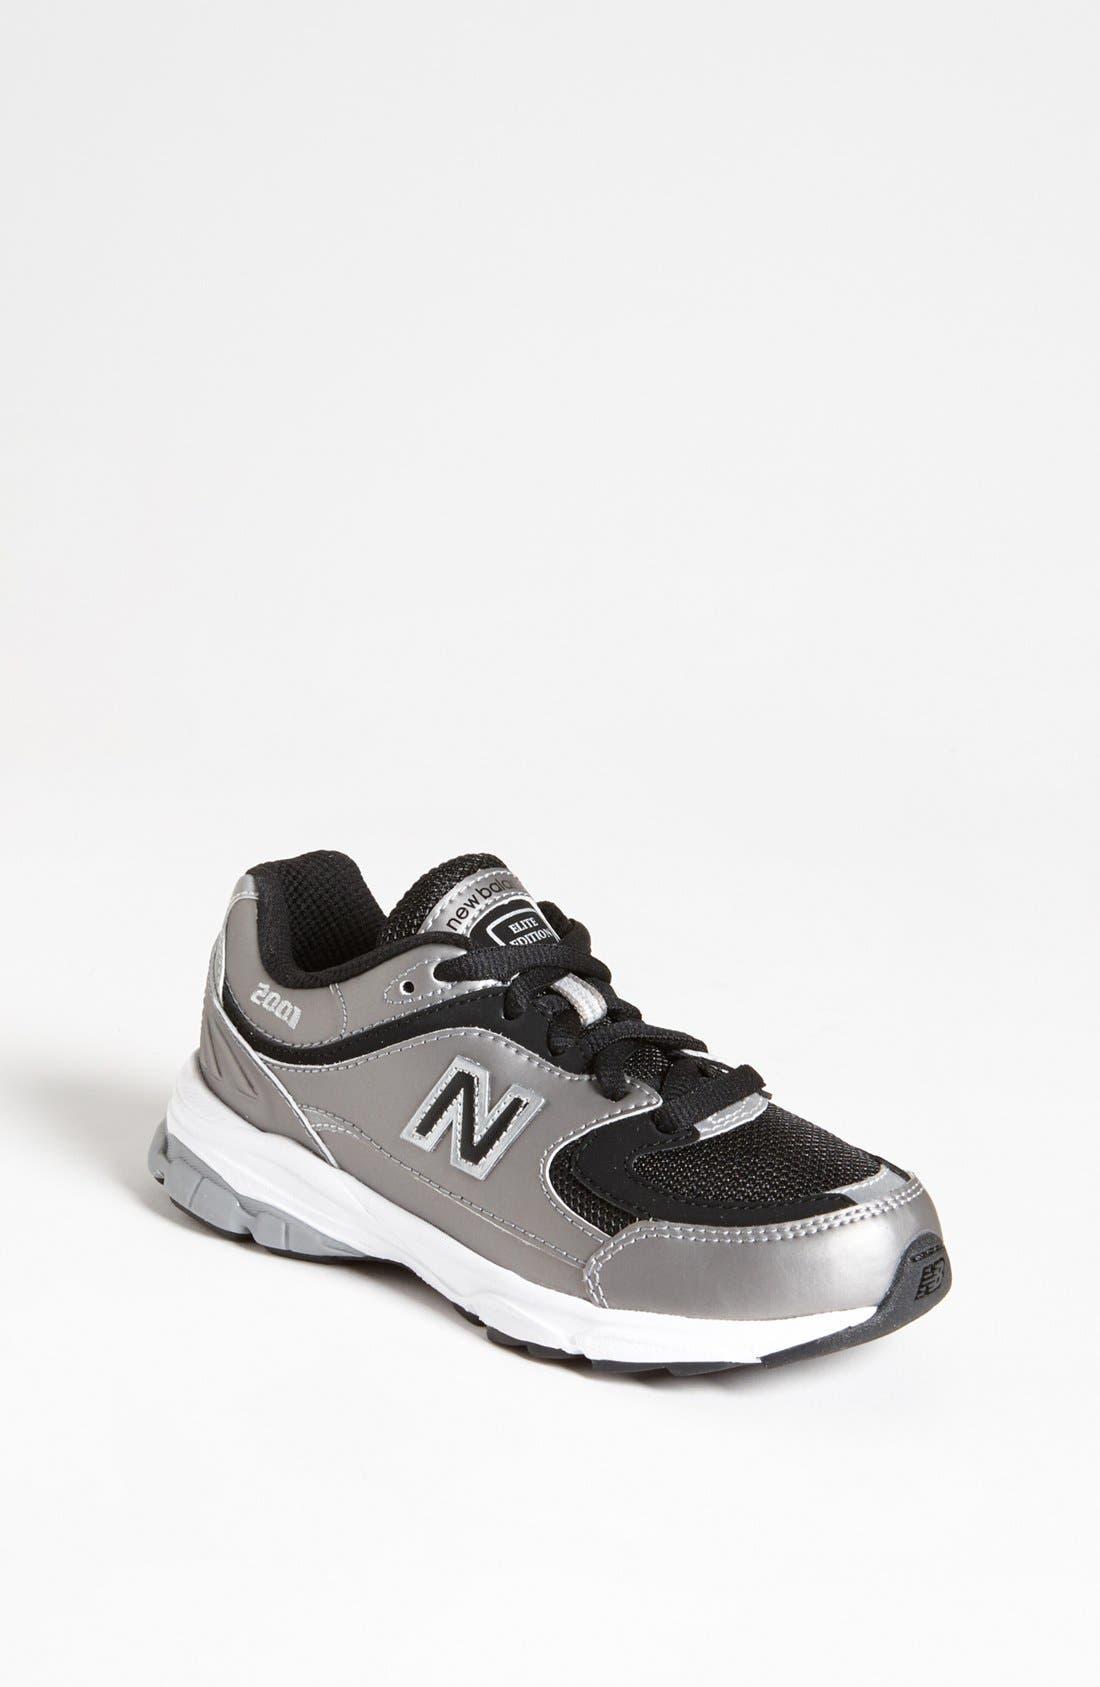 Main Image - New Balance '2001' Sneaker (Toddler, Little Kid & Big Kid)